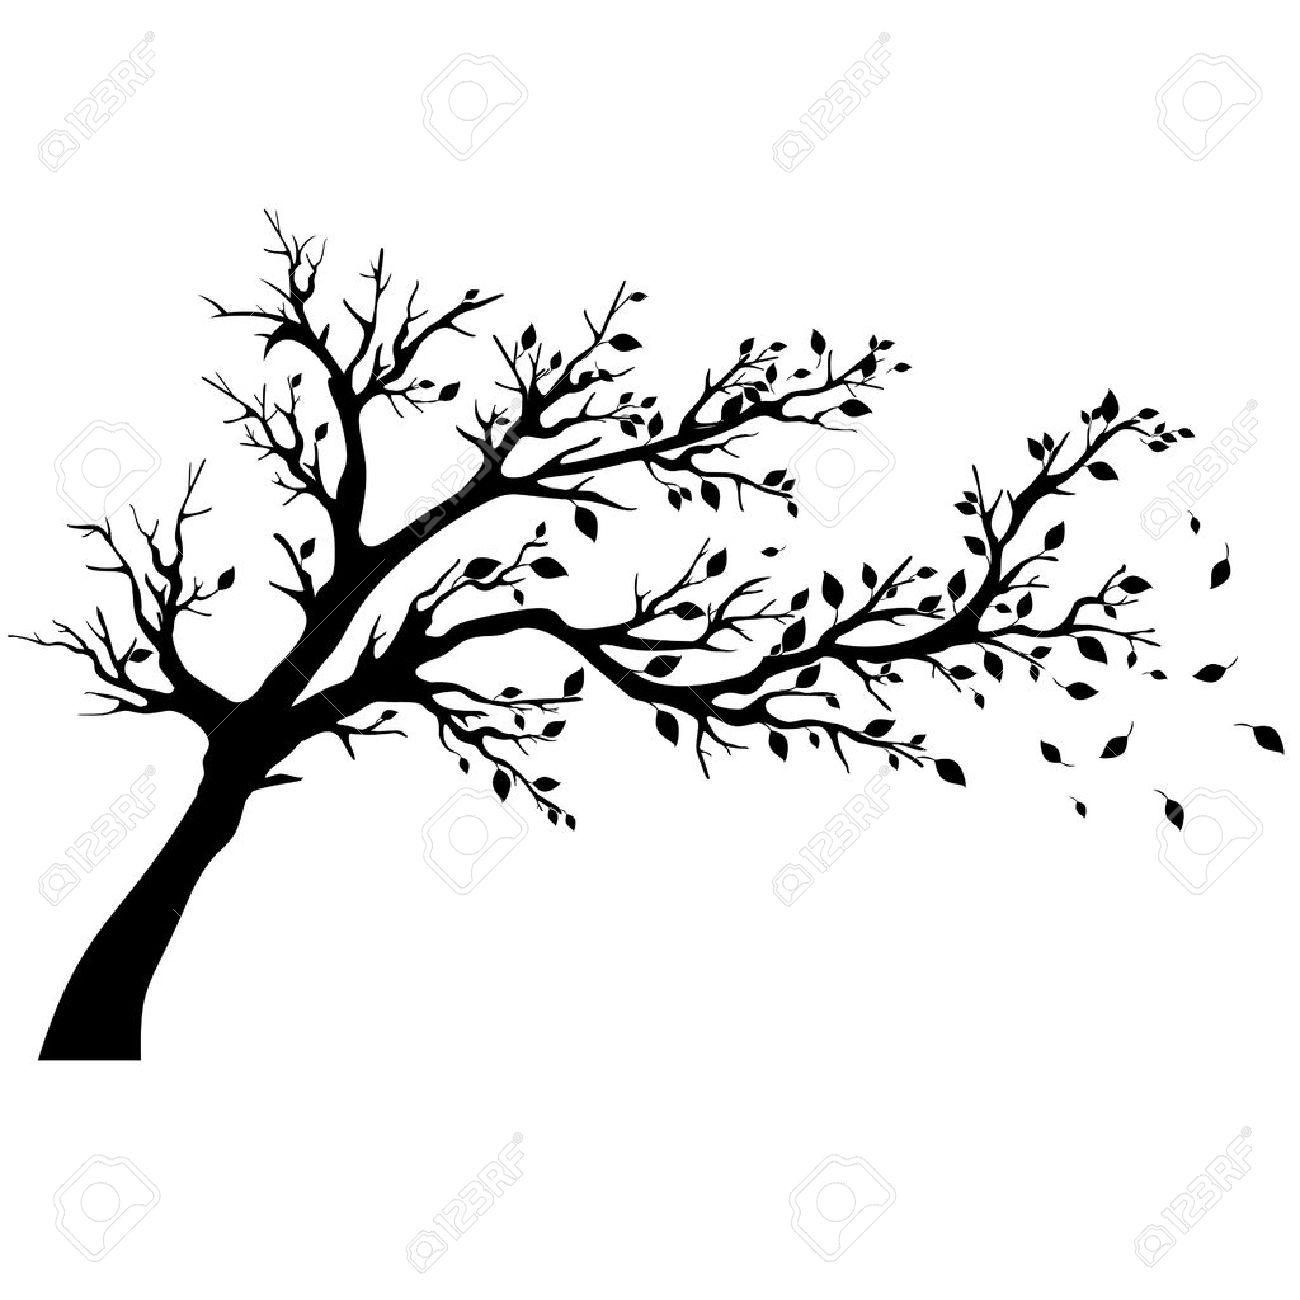 Tree silhouettes - 16761905